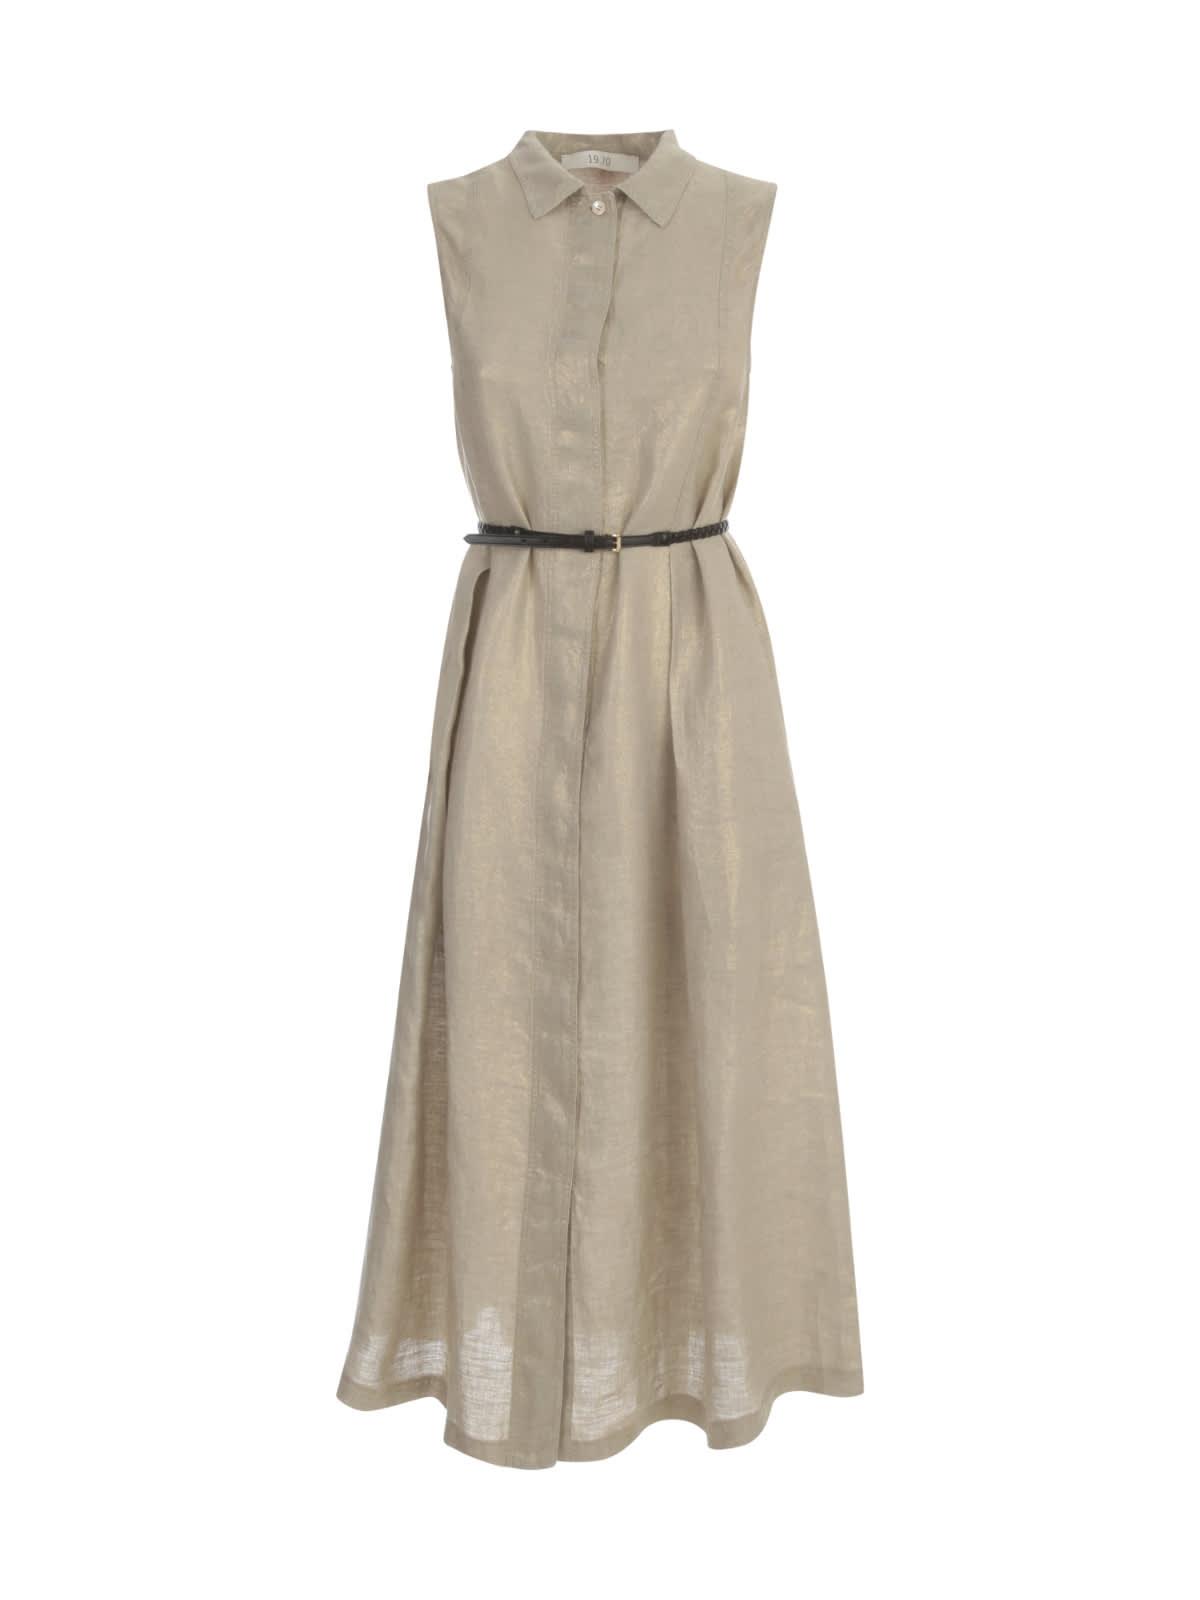 Buy 19.70 Nineteen Seventy Sleeveless Dress W/belt online, shop 19.70 Nineteen Seventy with free shipping